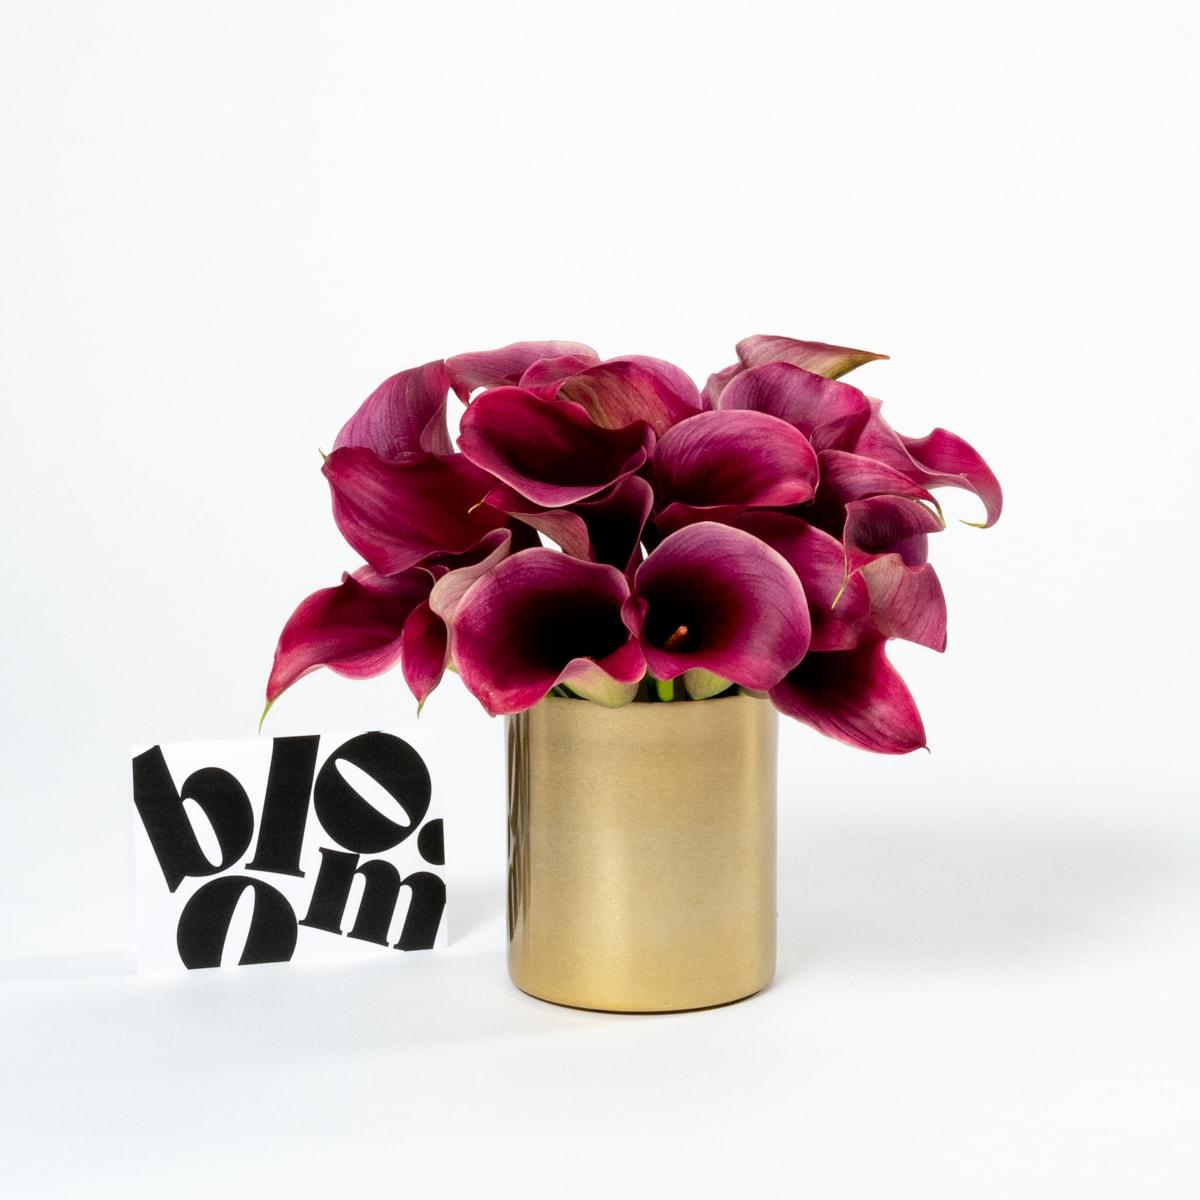 bloom - Brass Plant Pot & Vase